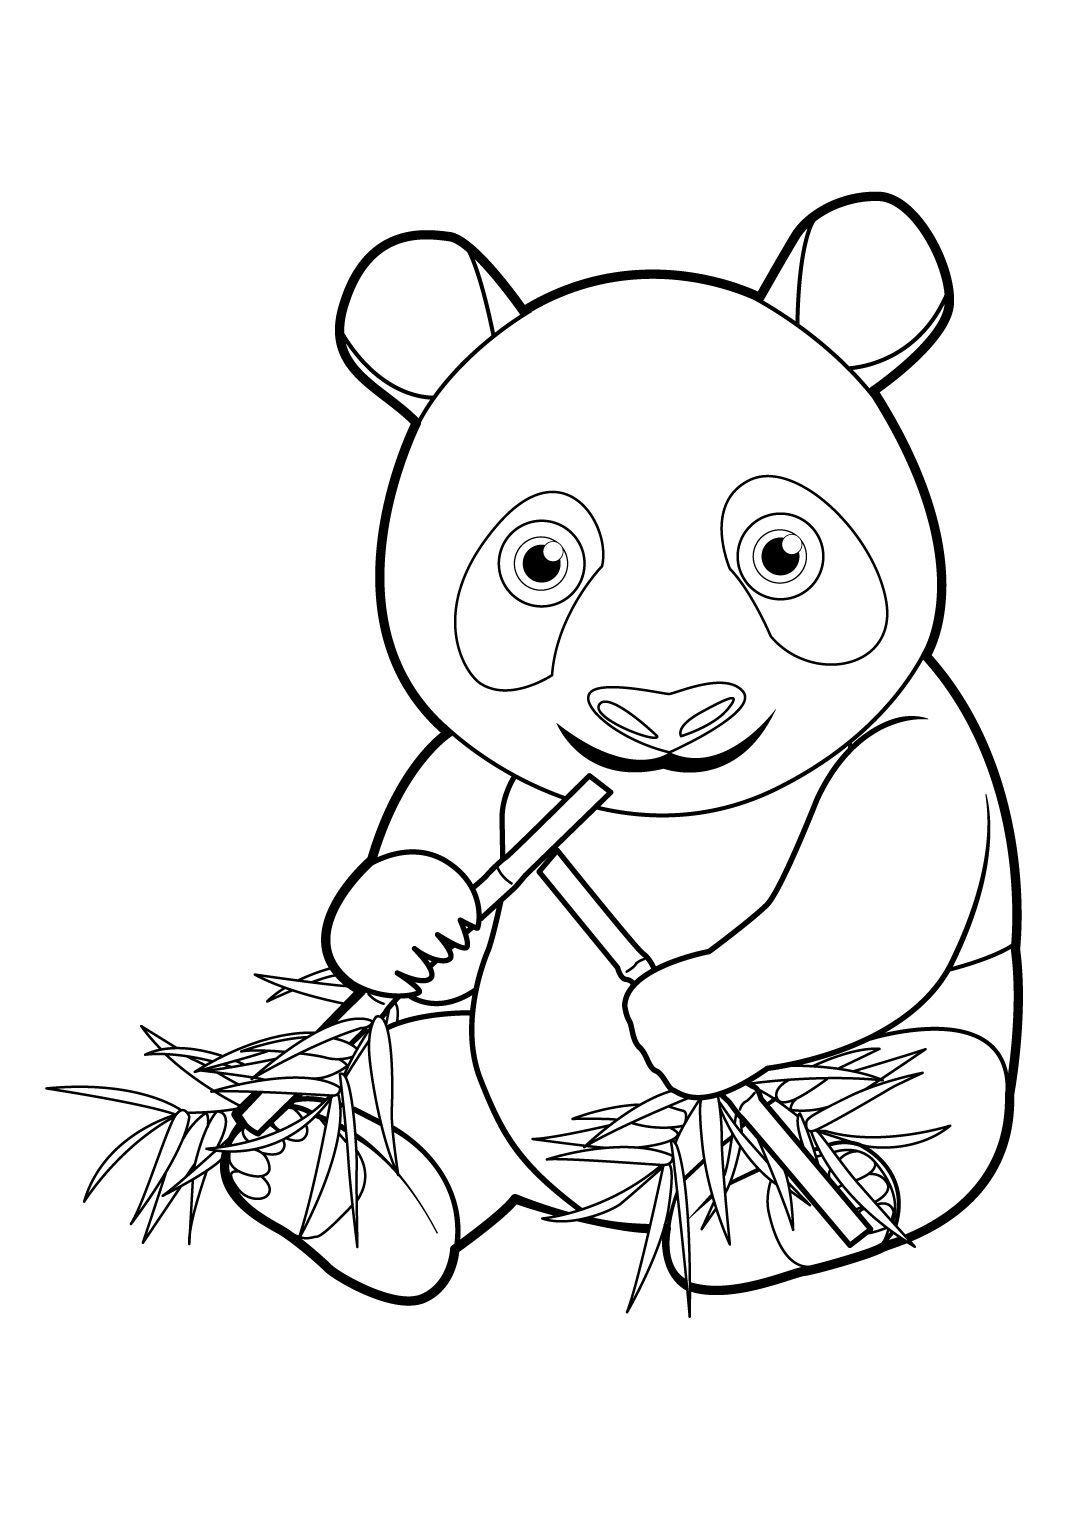 Coloriage Panda 16 - Coloriage Pandas - Coloriages Animaux